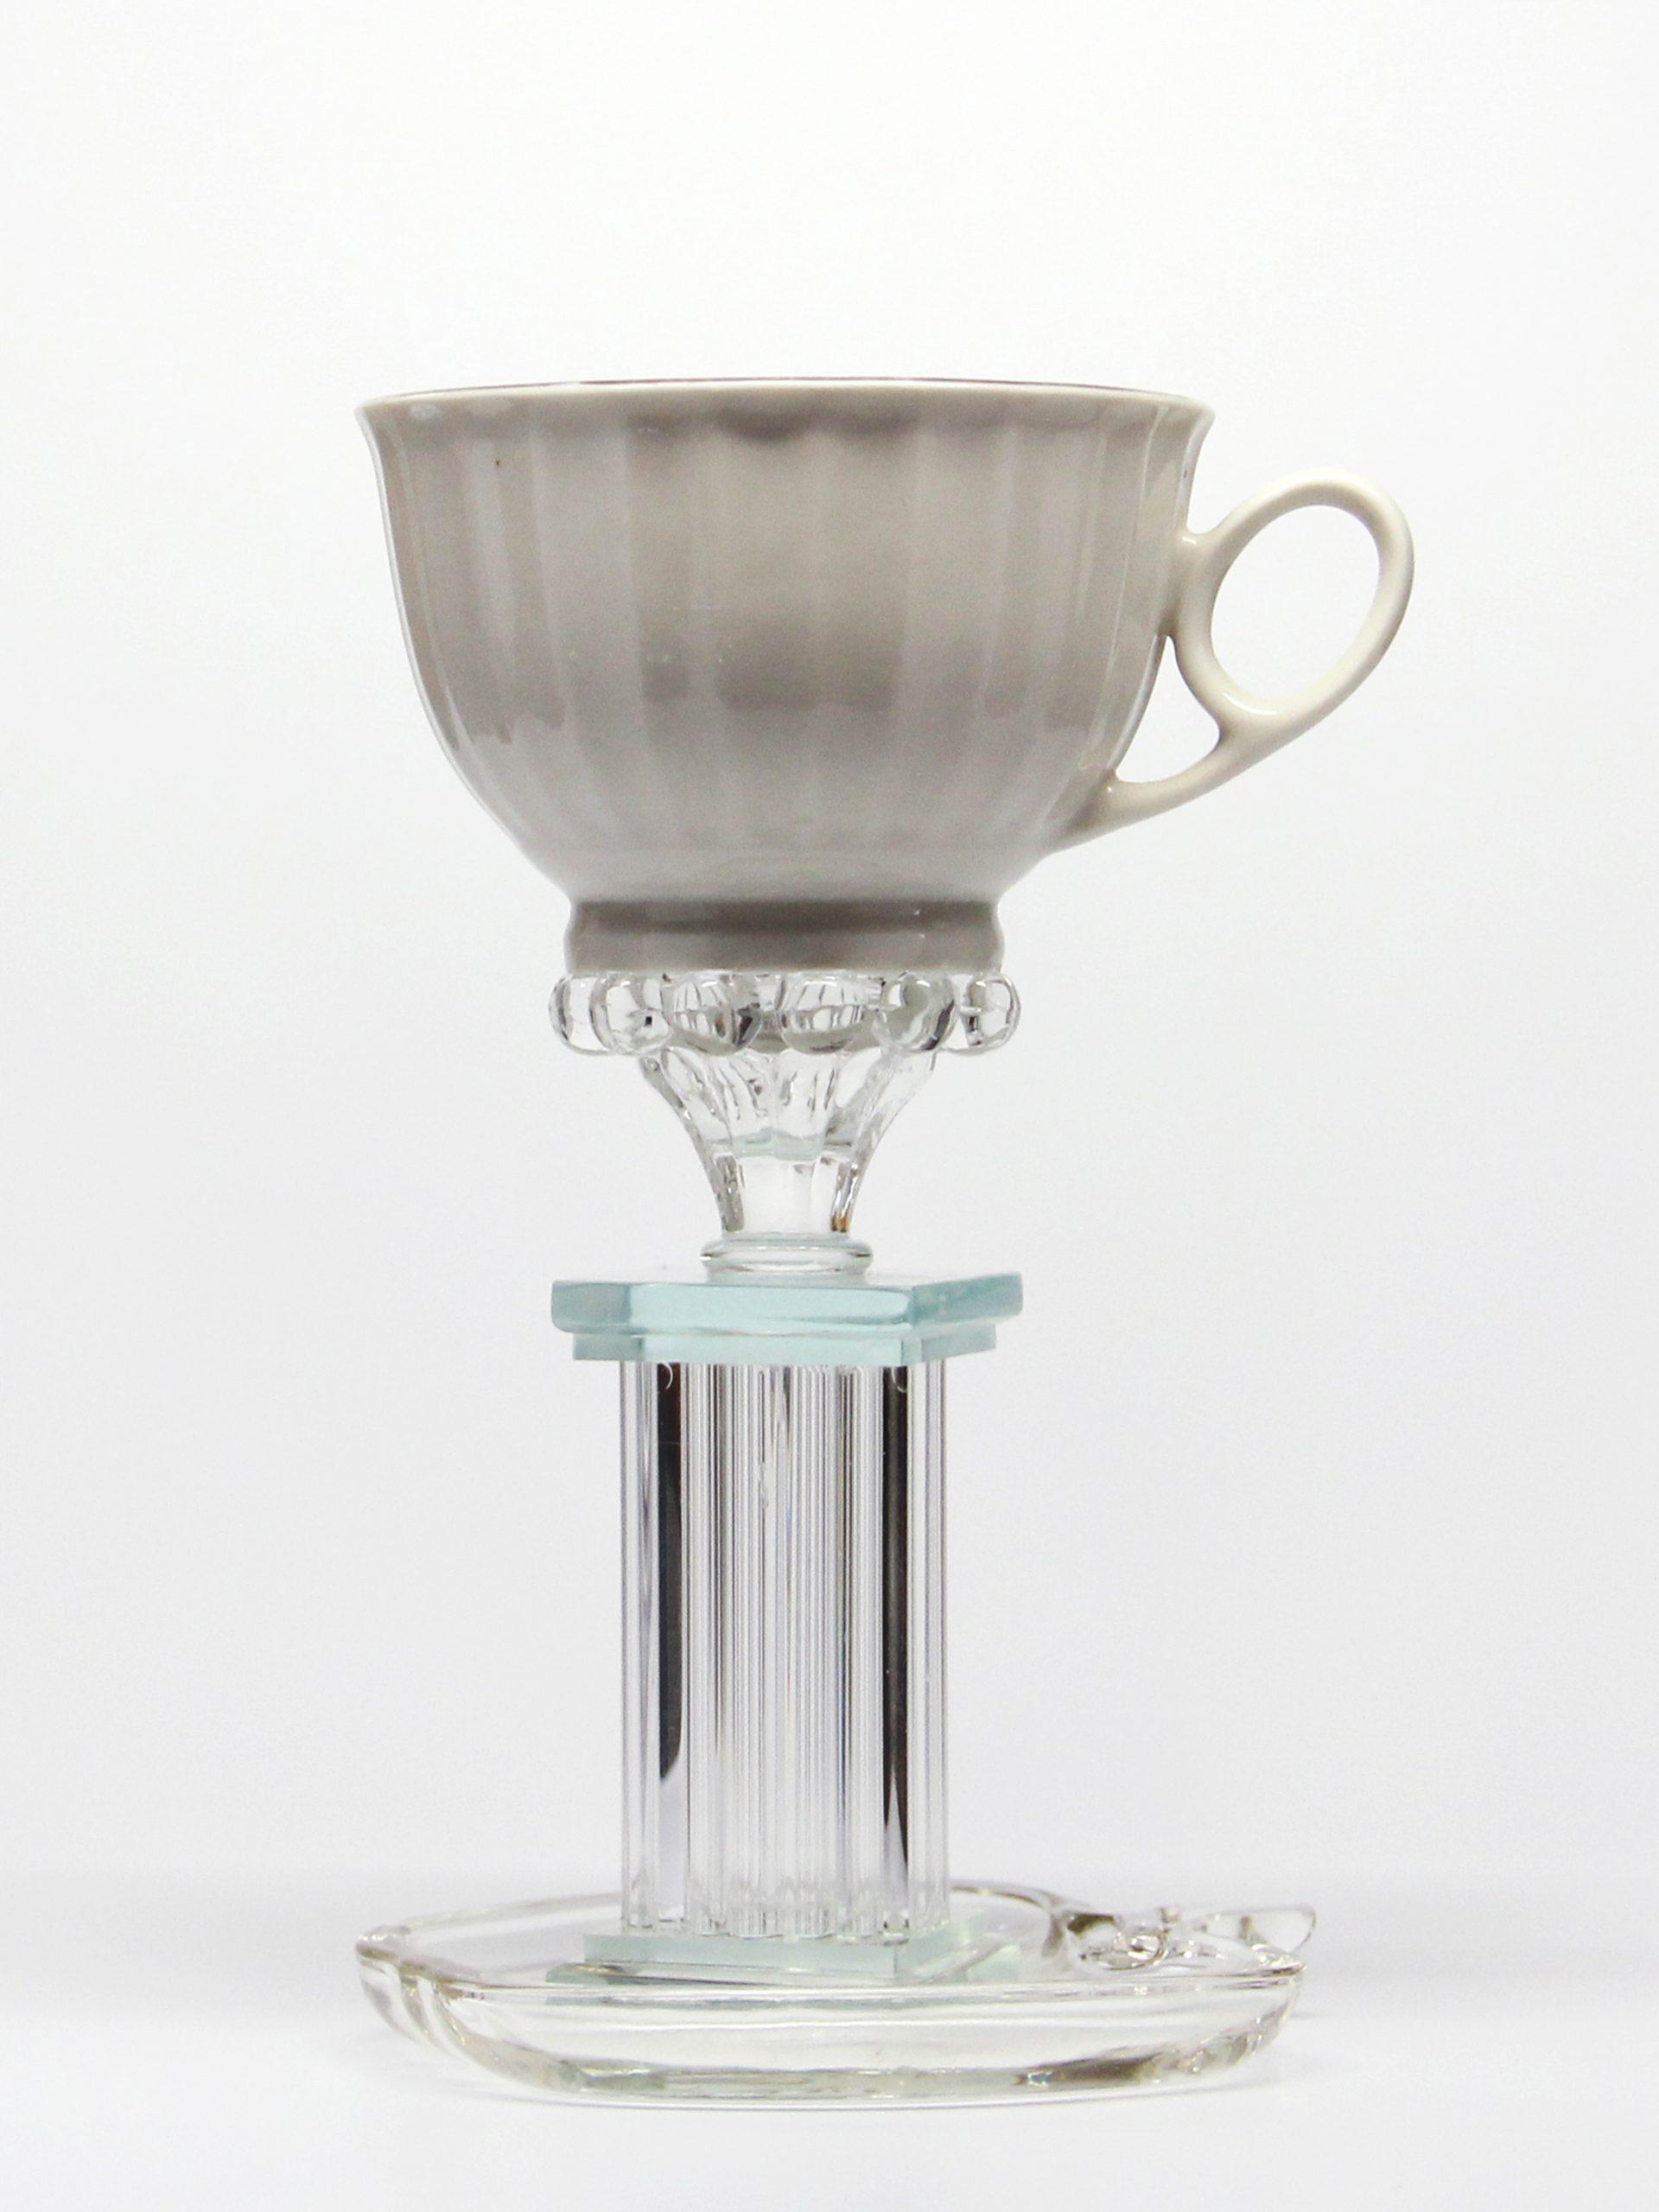 Christopher Kerr-Ayer, Tea Cup